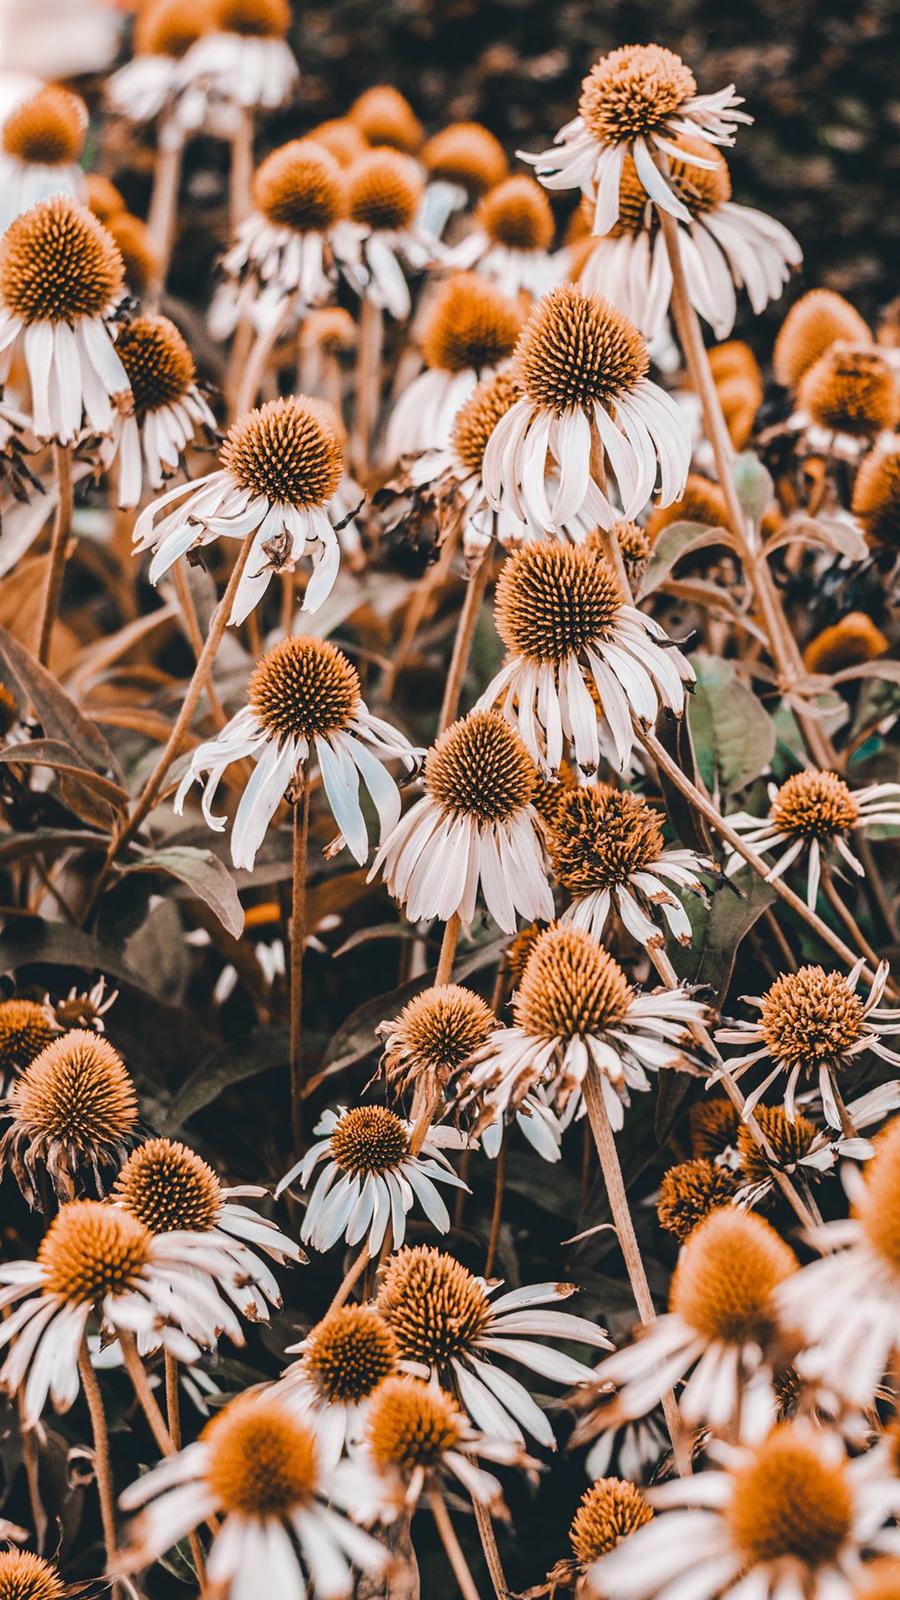 Flower Wallpaper – Nature Wallpapers Free Download